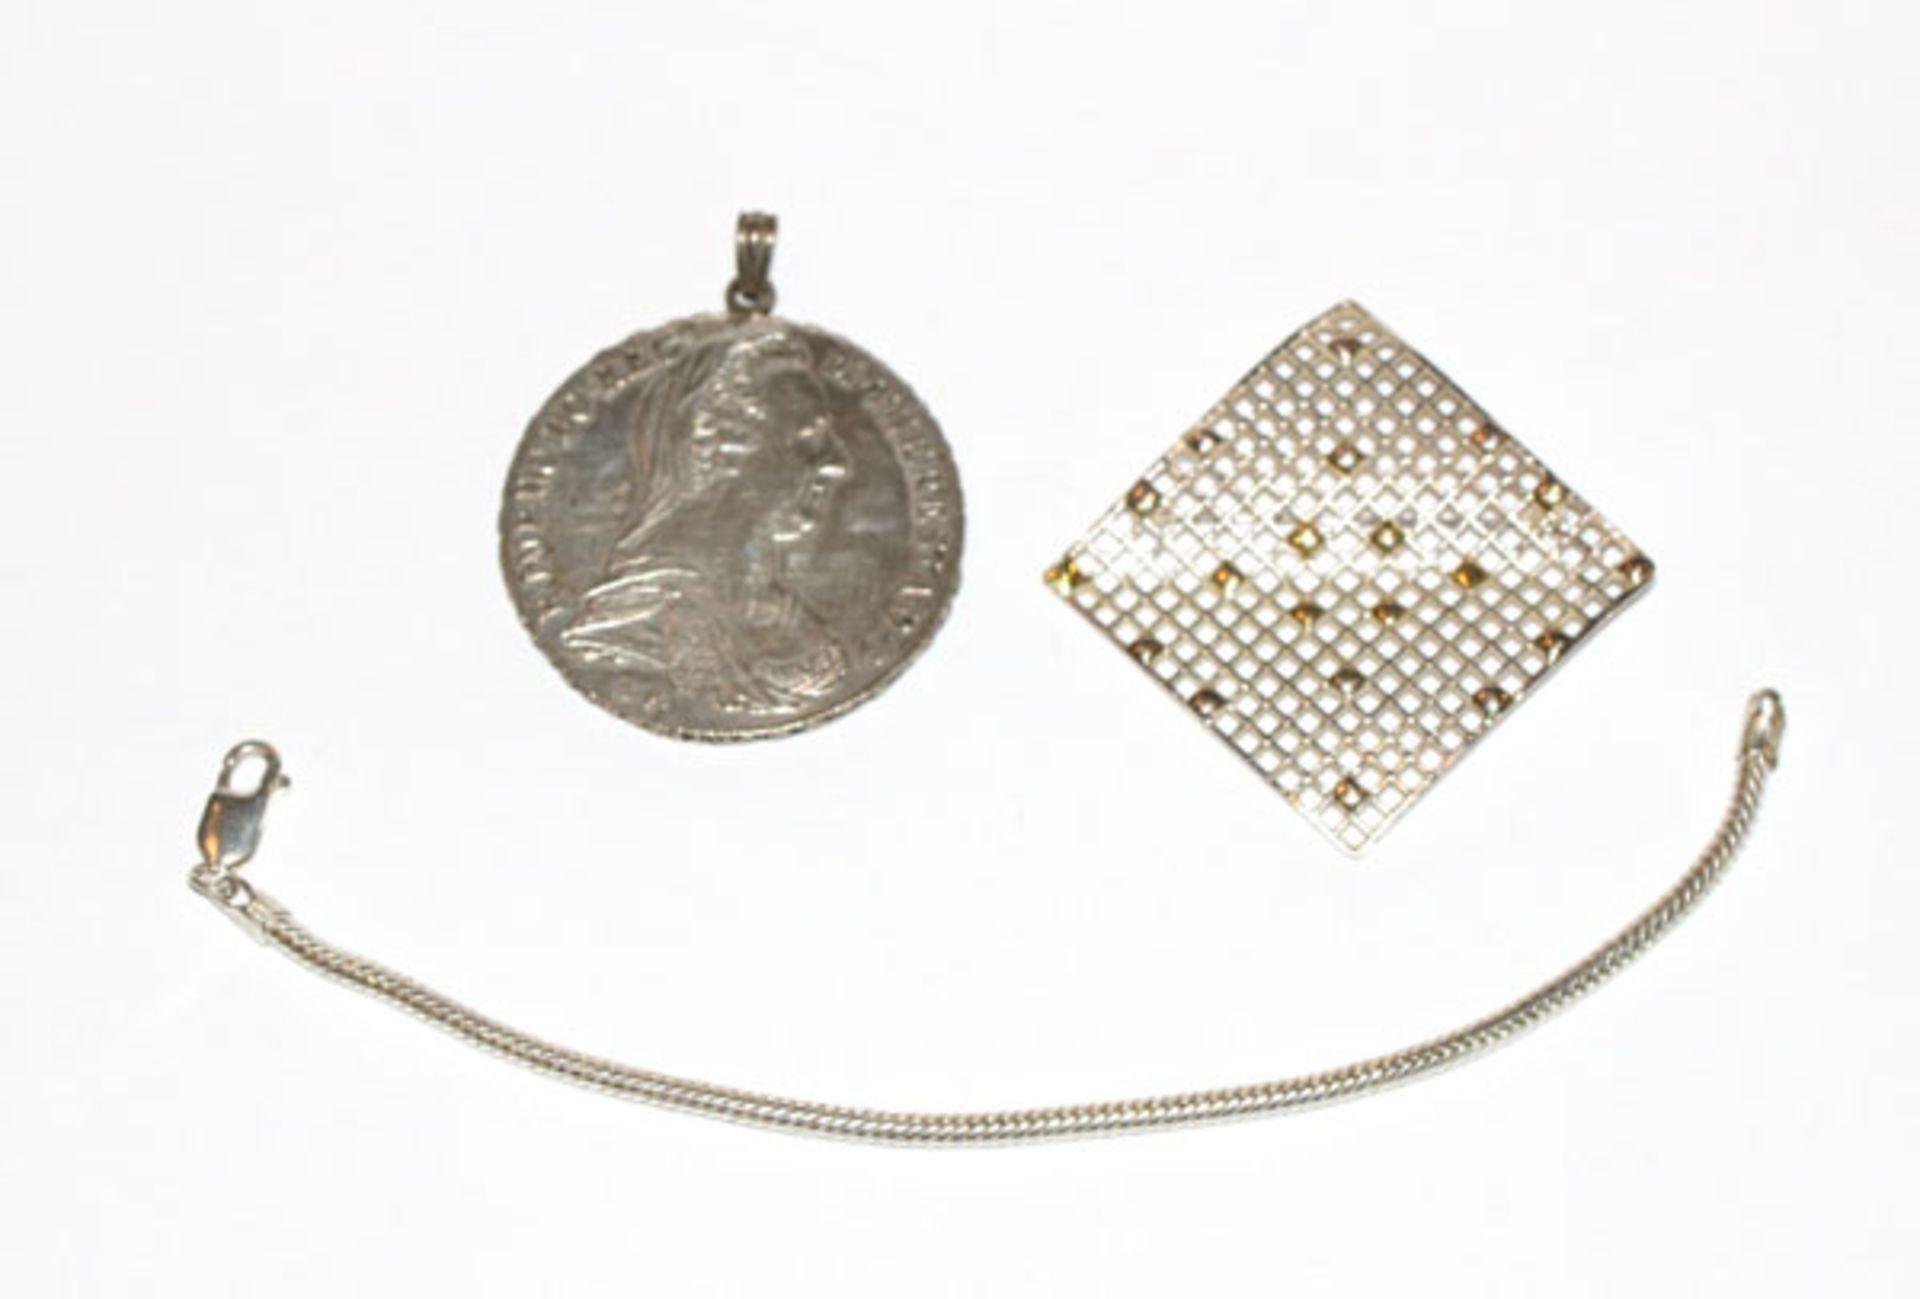 Silber-Kovolut: Designer Brosche in Gitterform, 3,8 cm x 3,8 cm, Schlangen-Armband, L 16 cm,